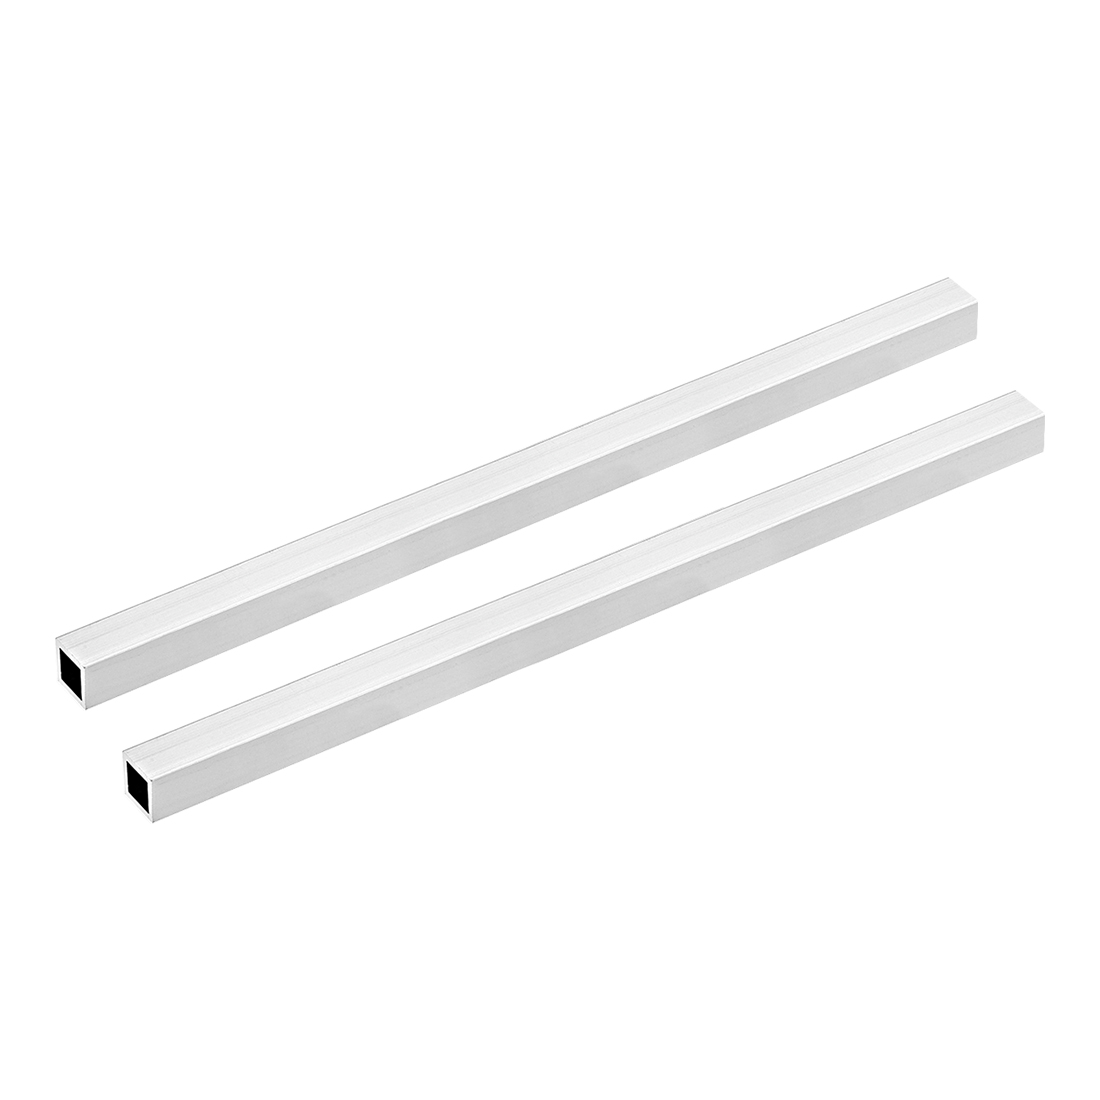 6063 Aluminum Square Tube 15mmx15mmx1.5mm Wall Thickness 300mm Long Tubing 2 Pcs